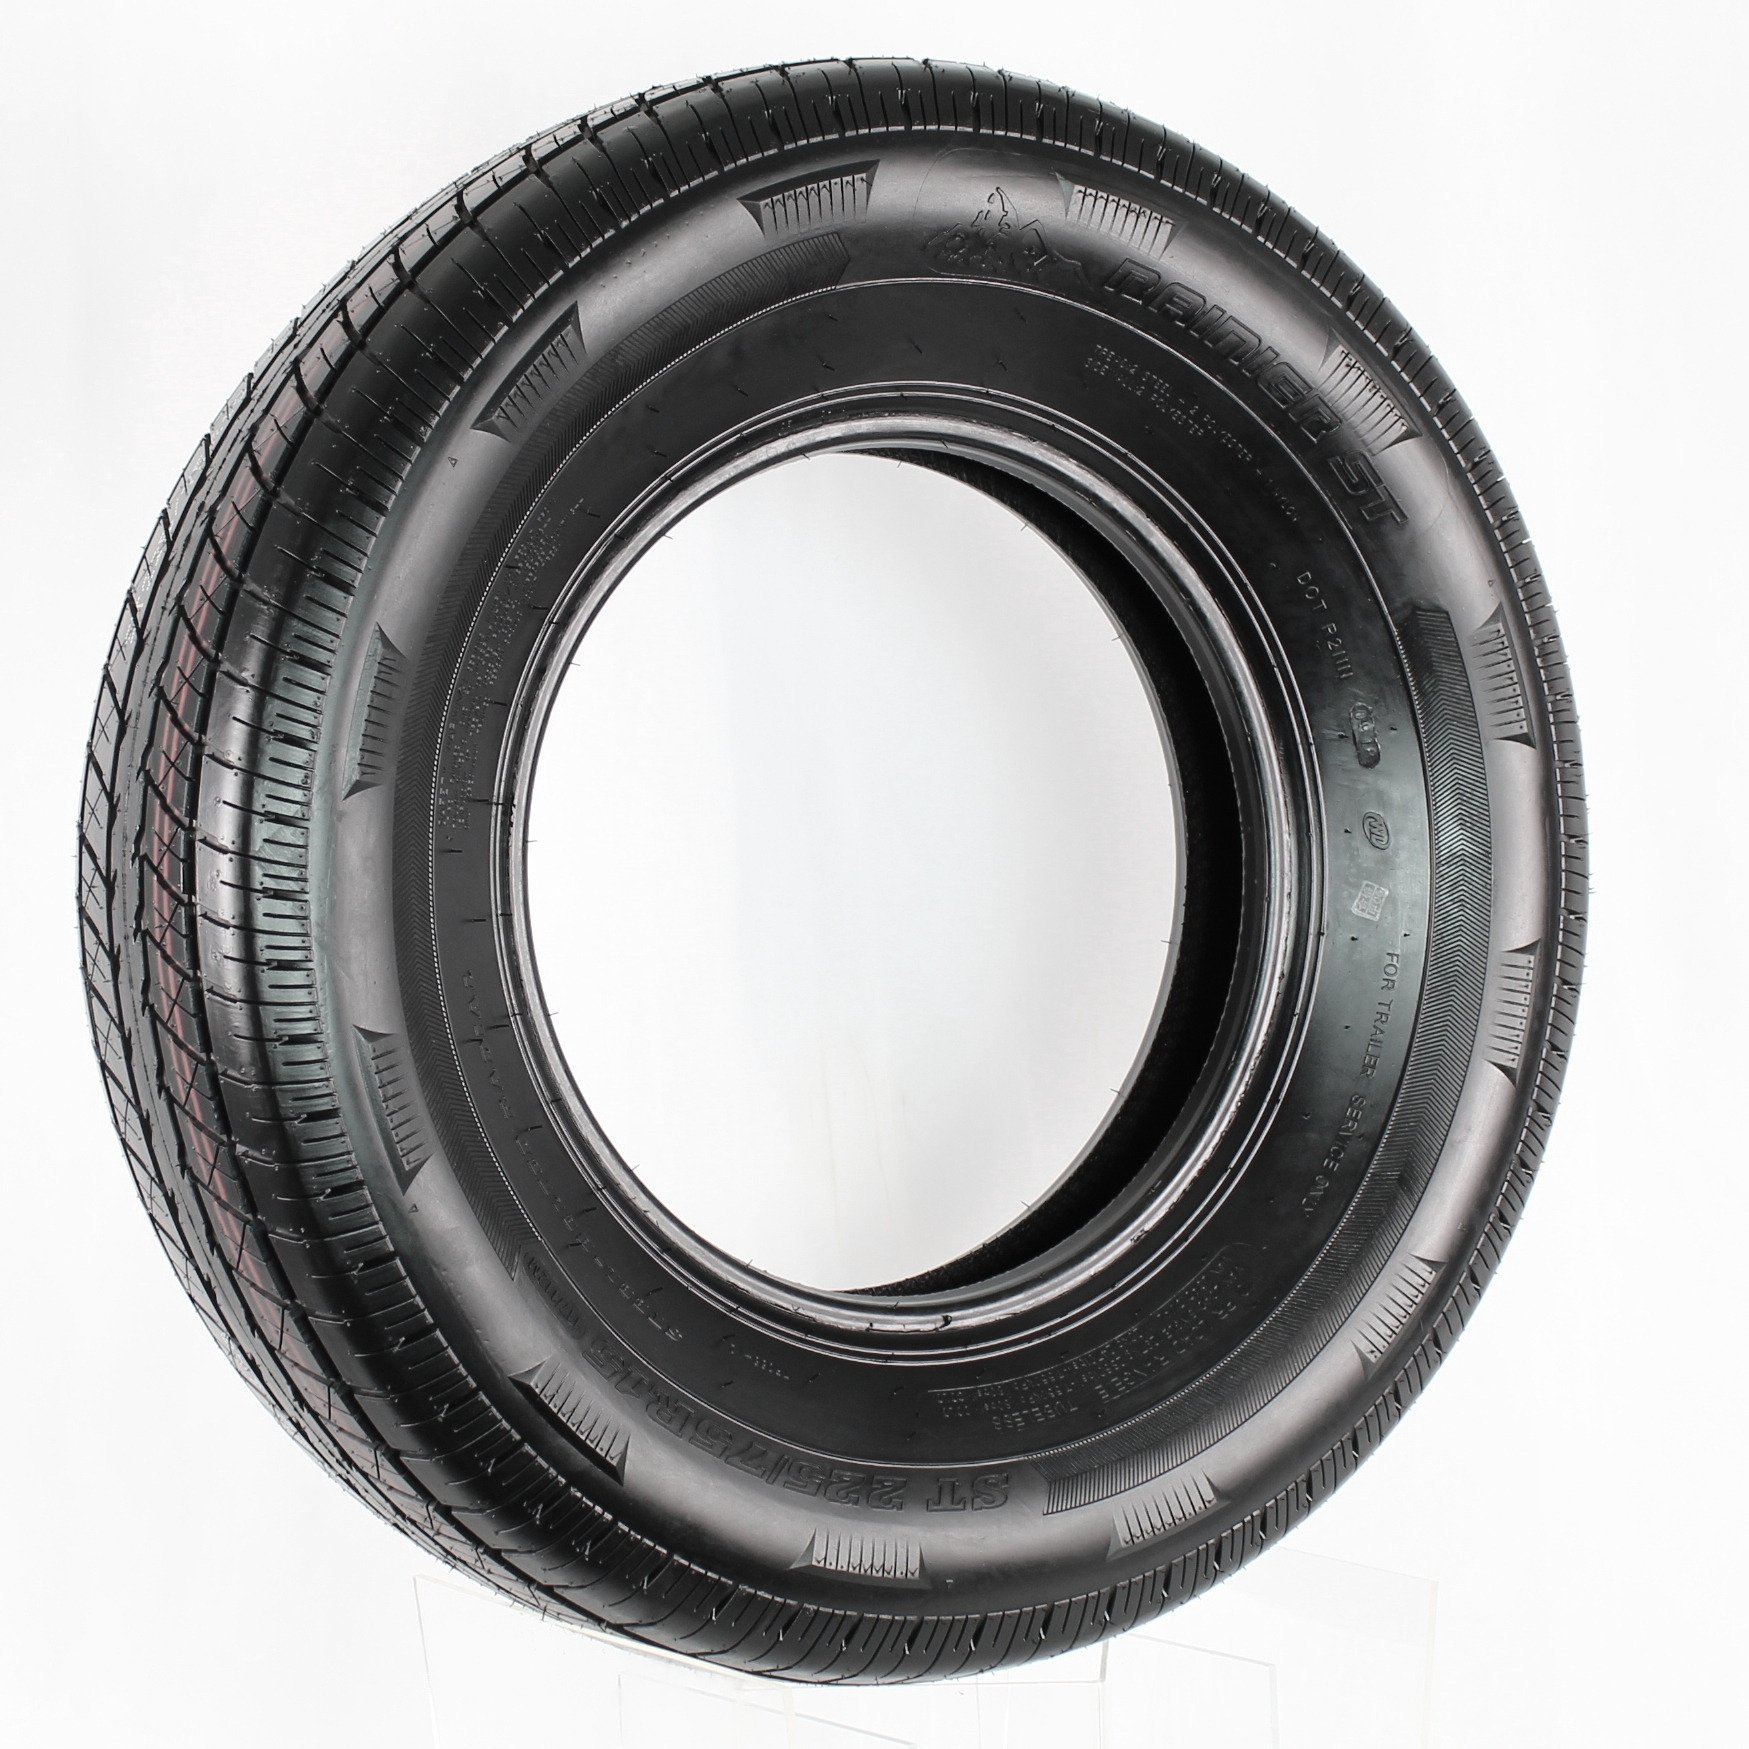 Rainier ST225/75R15 LRE 10-Ply Radial Trailer Tire Image